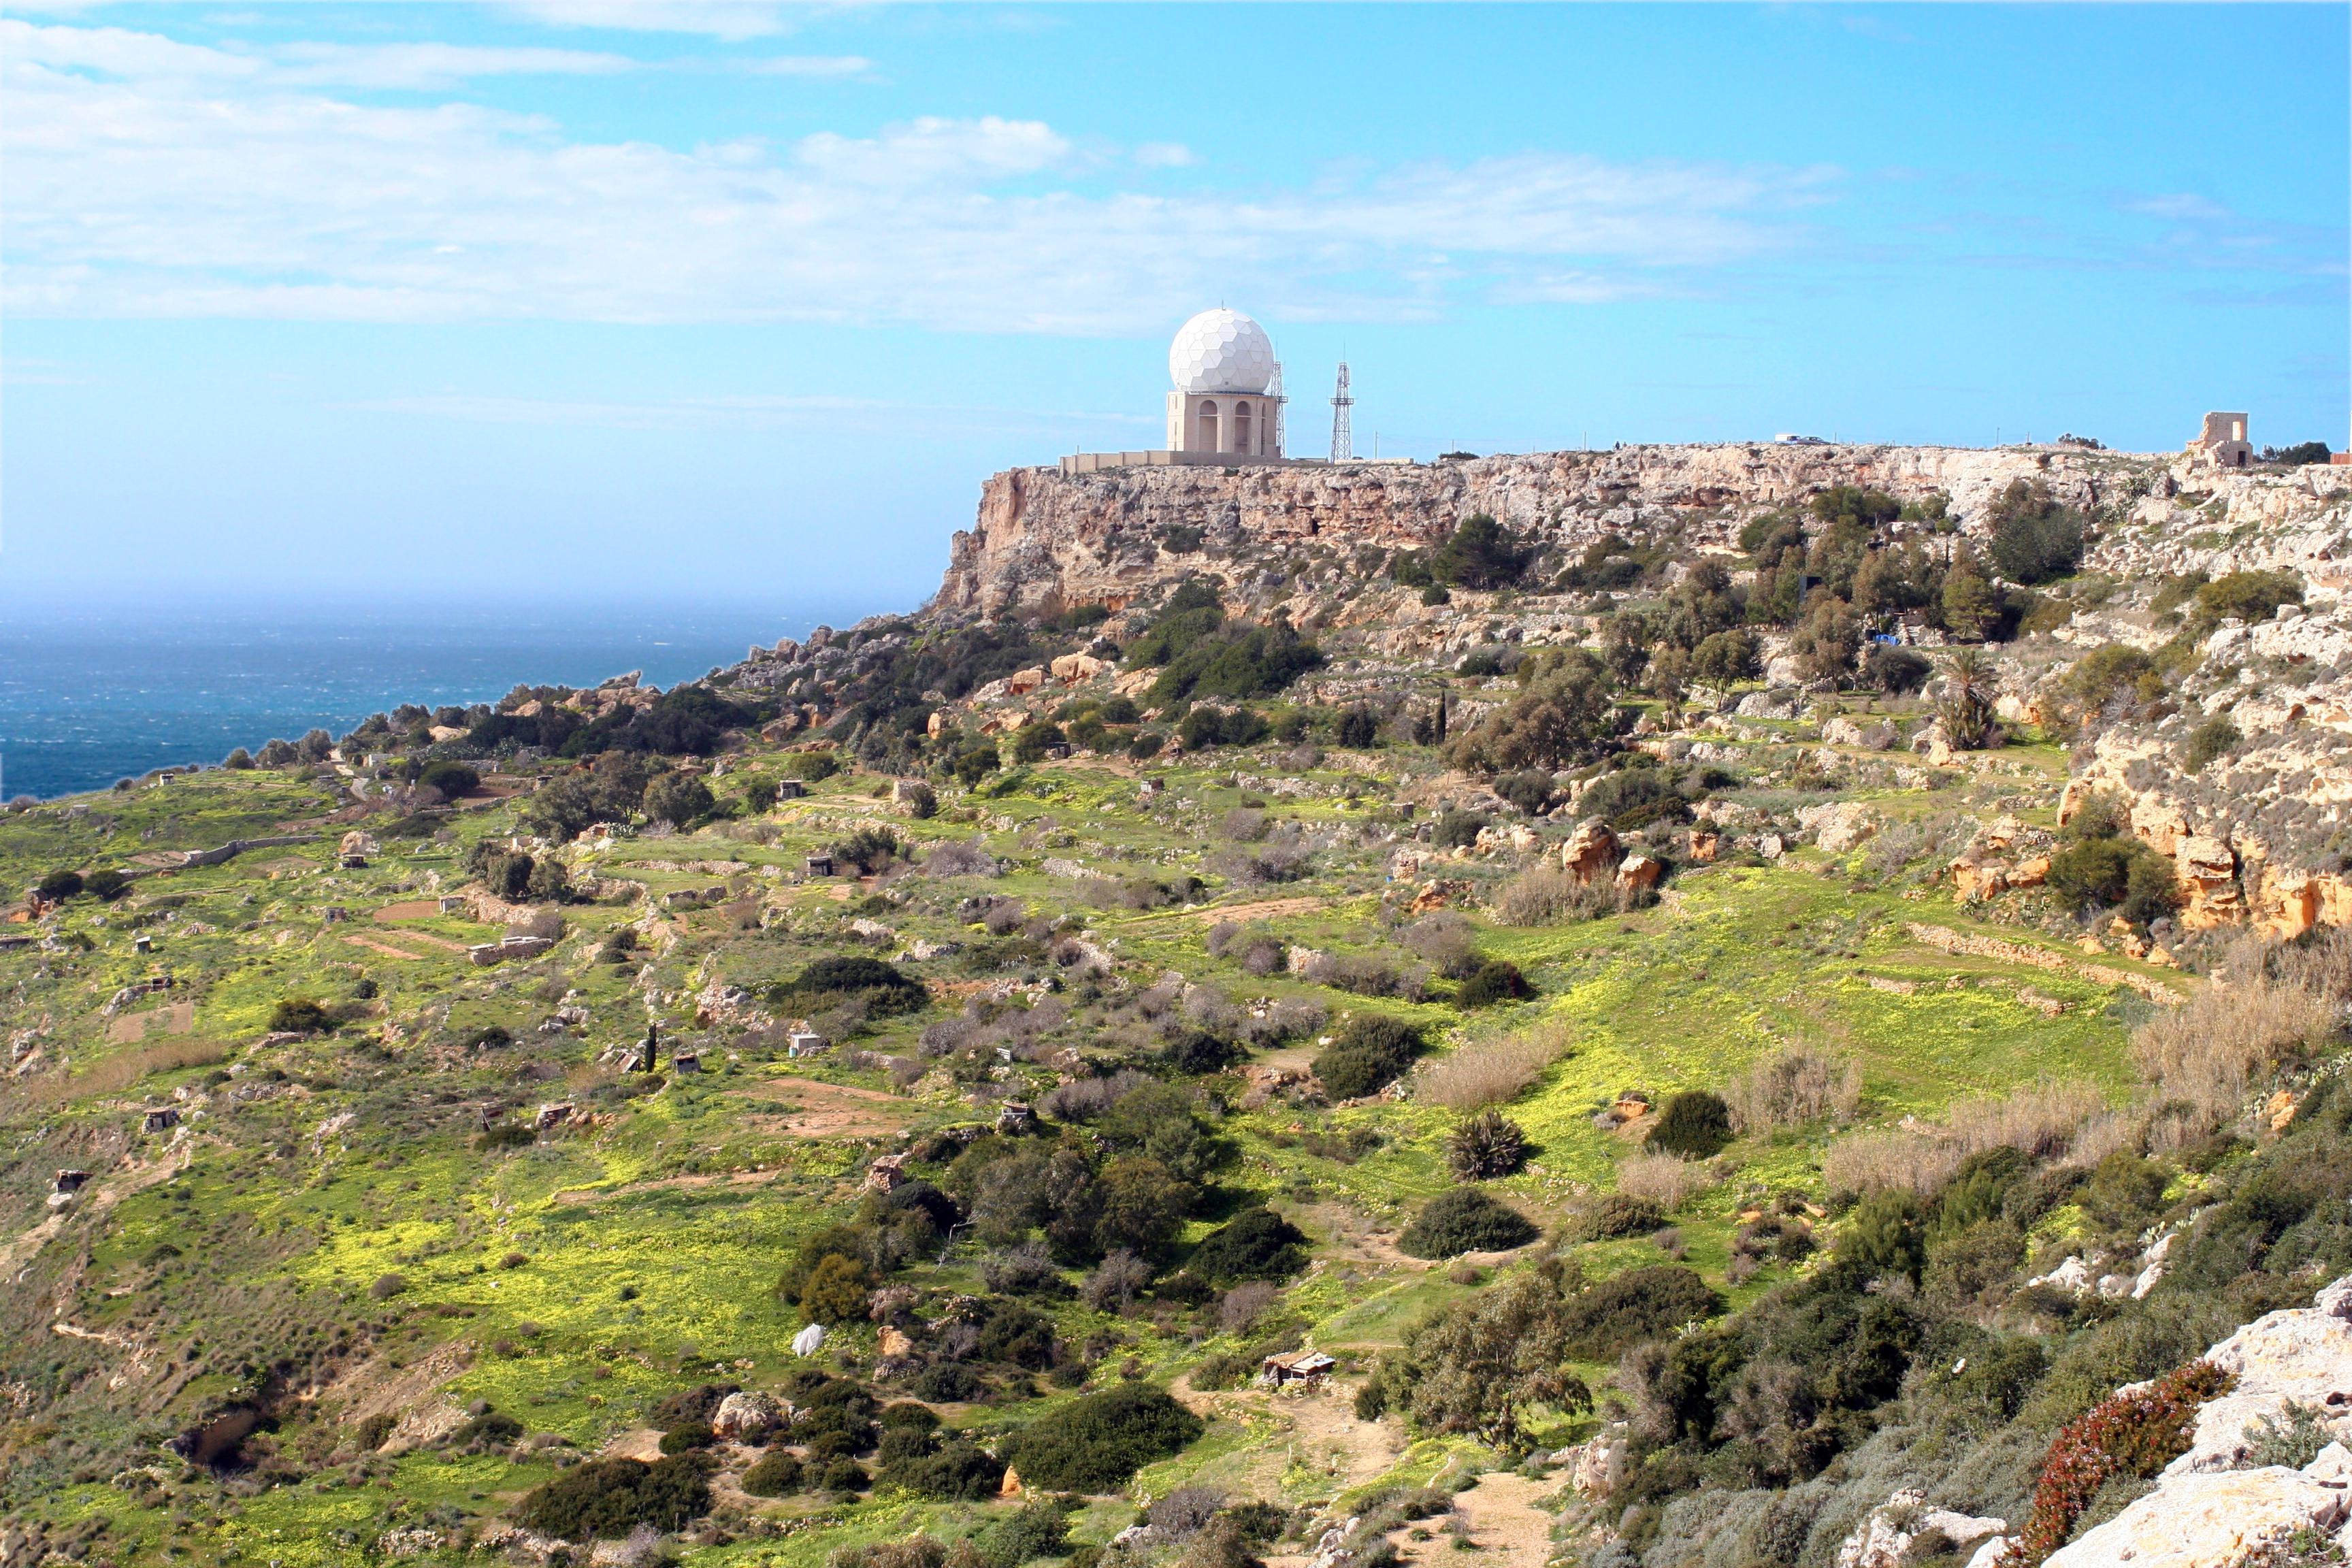 Die Dingli Cliffs, höchster Punkt des Archipels